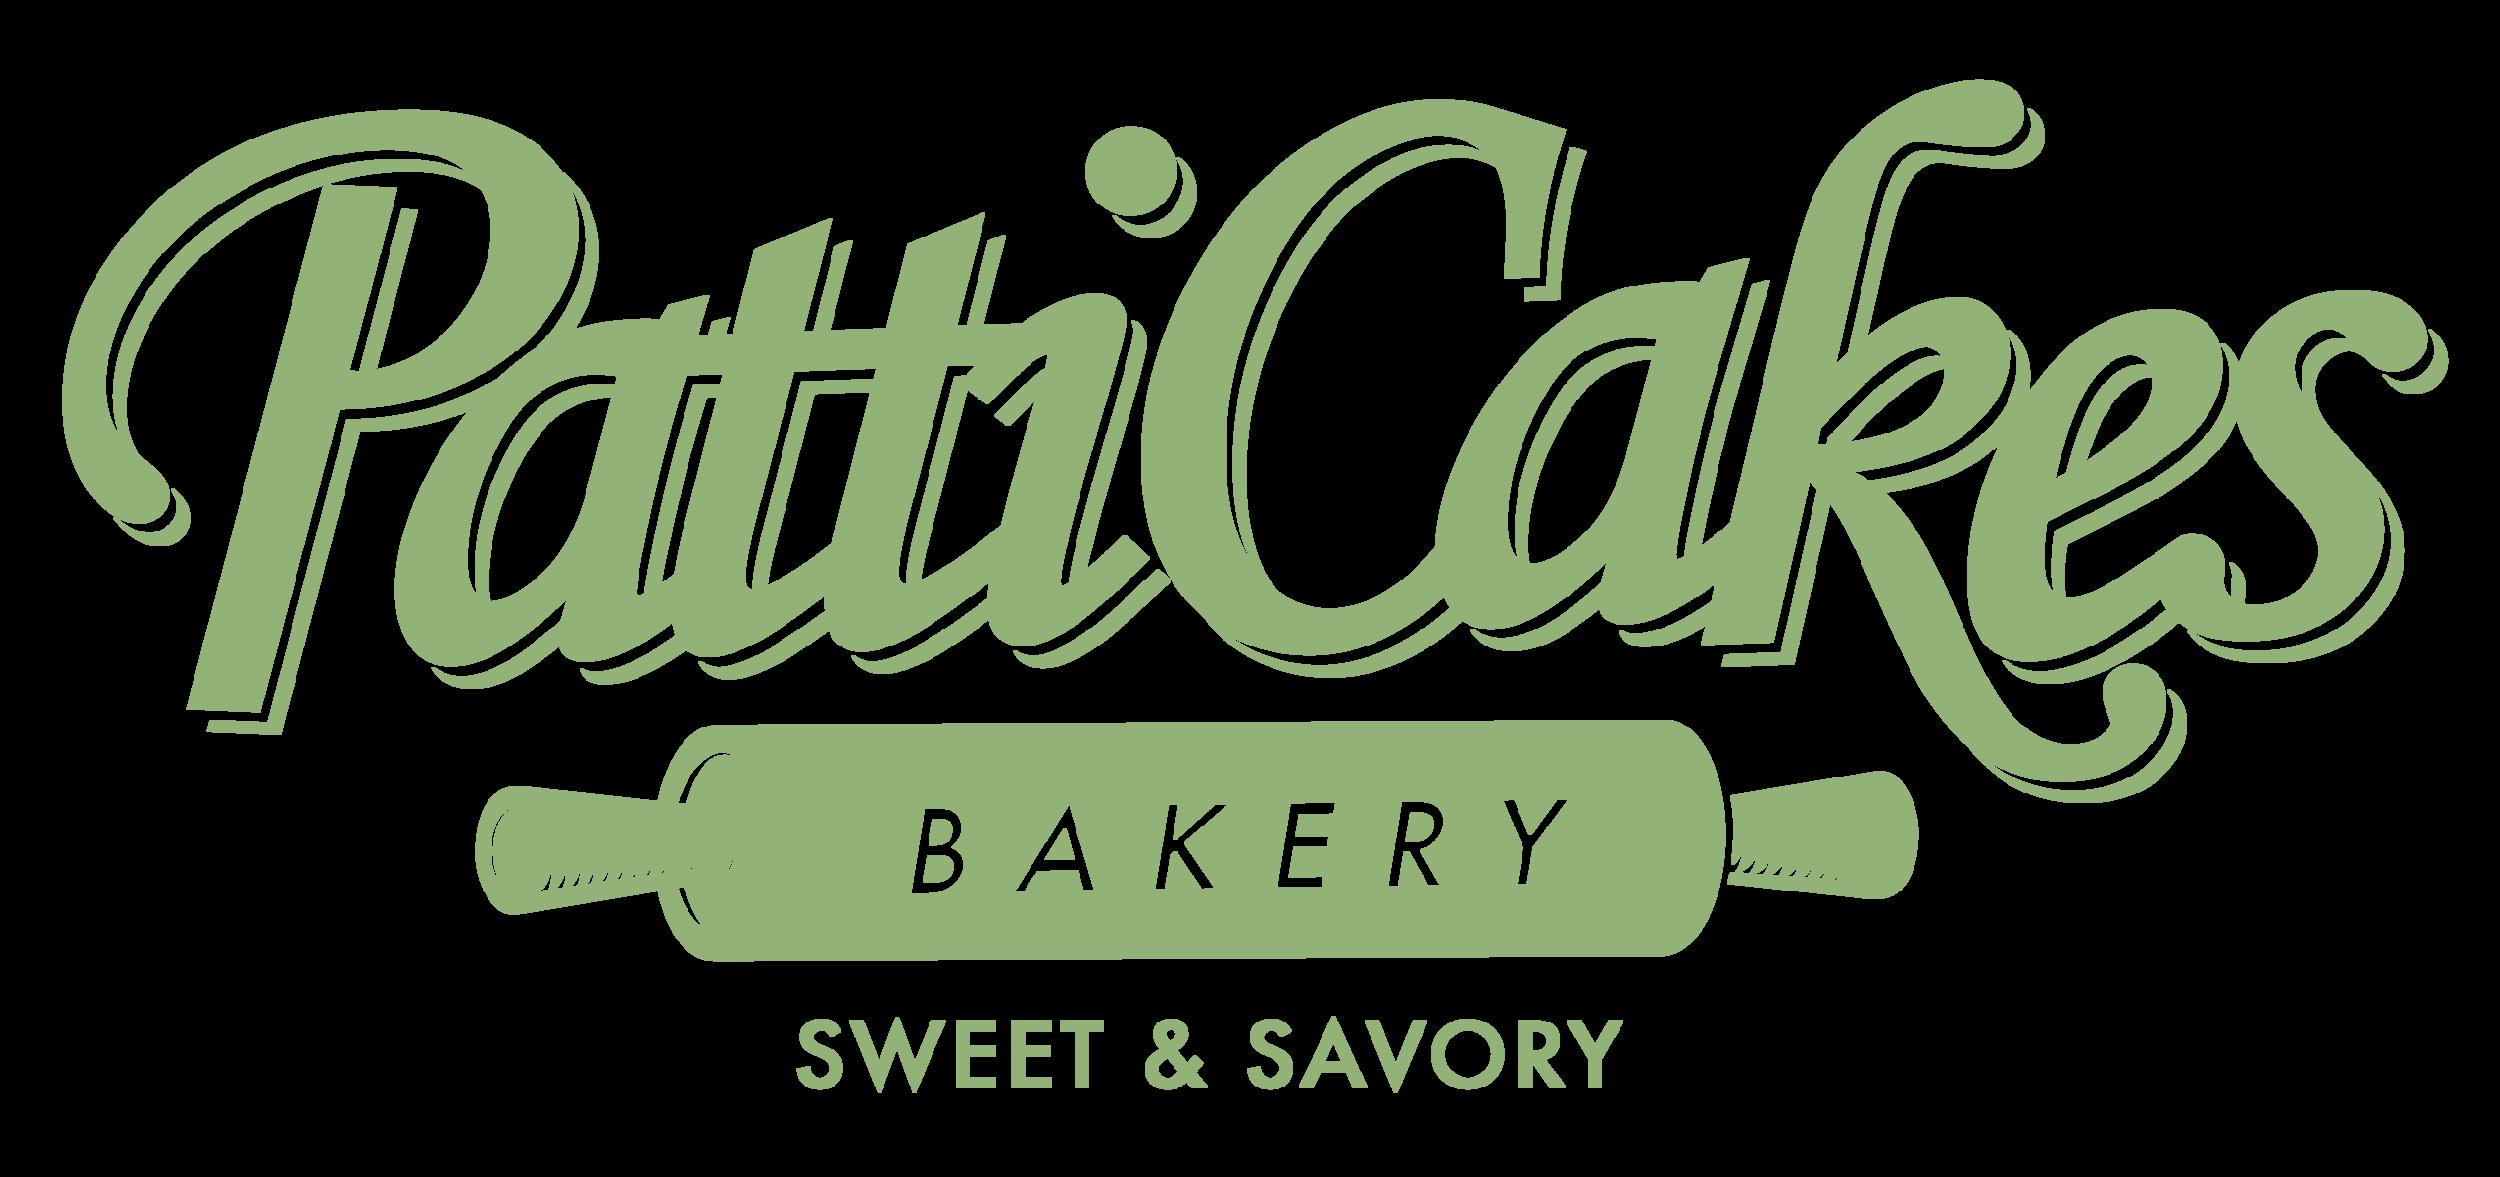 Patti Cakes Bakery logo-green.png